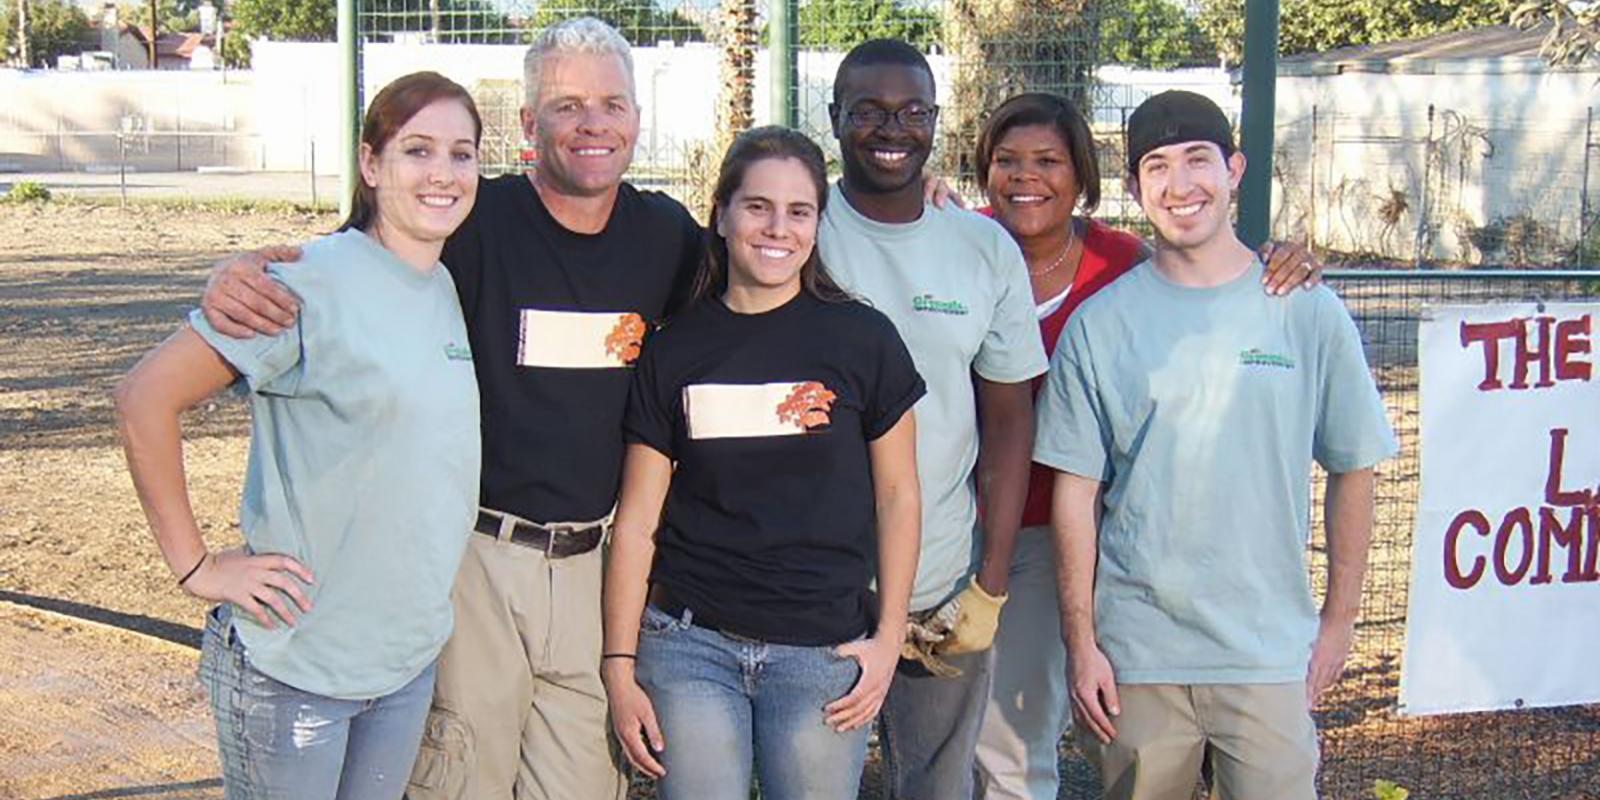 CPPLA students providing public service.